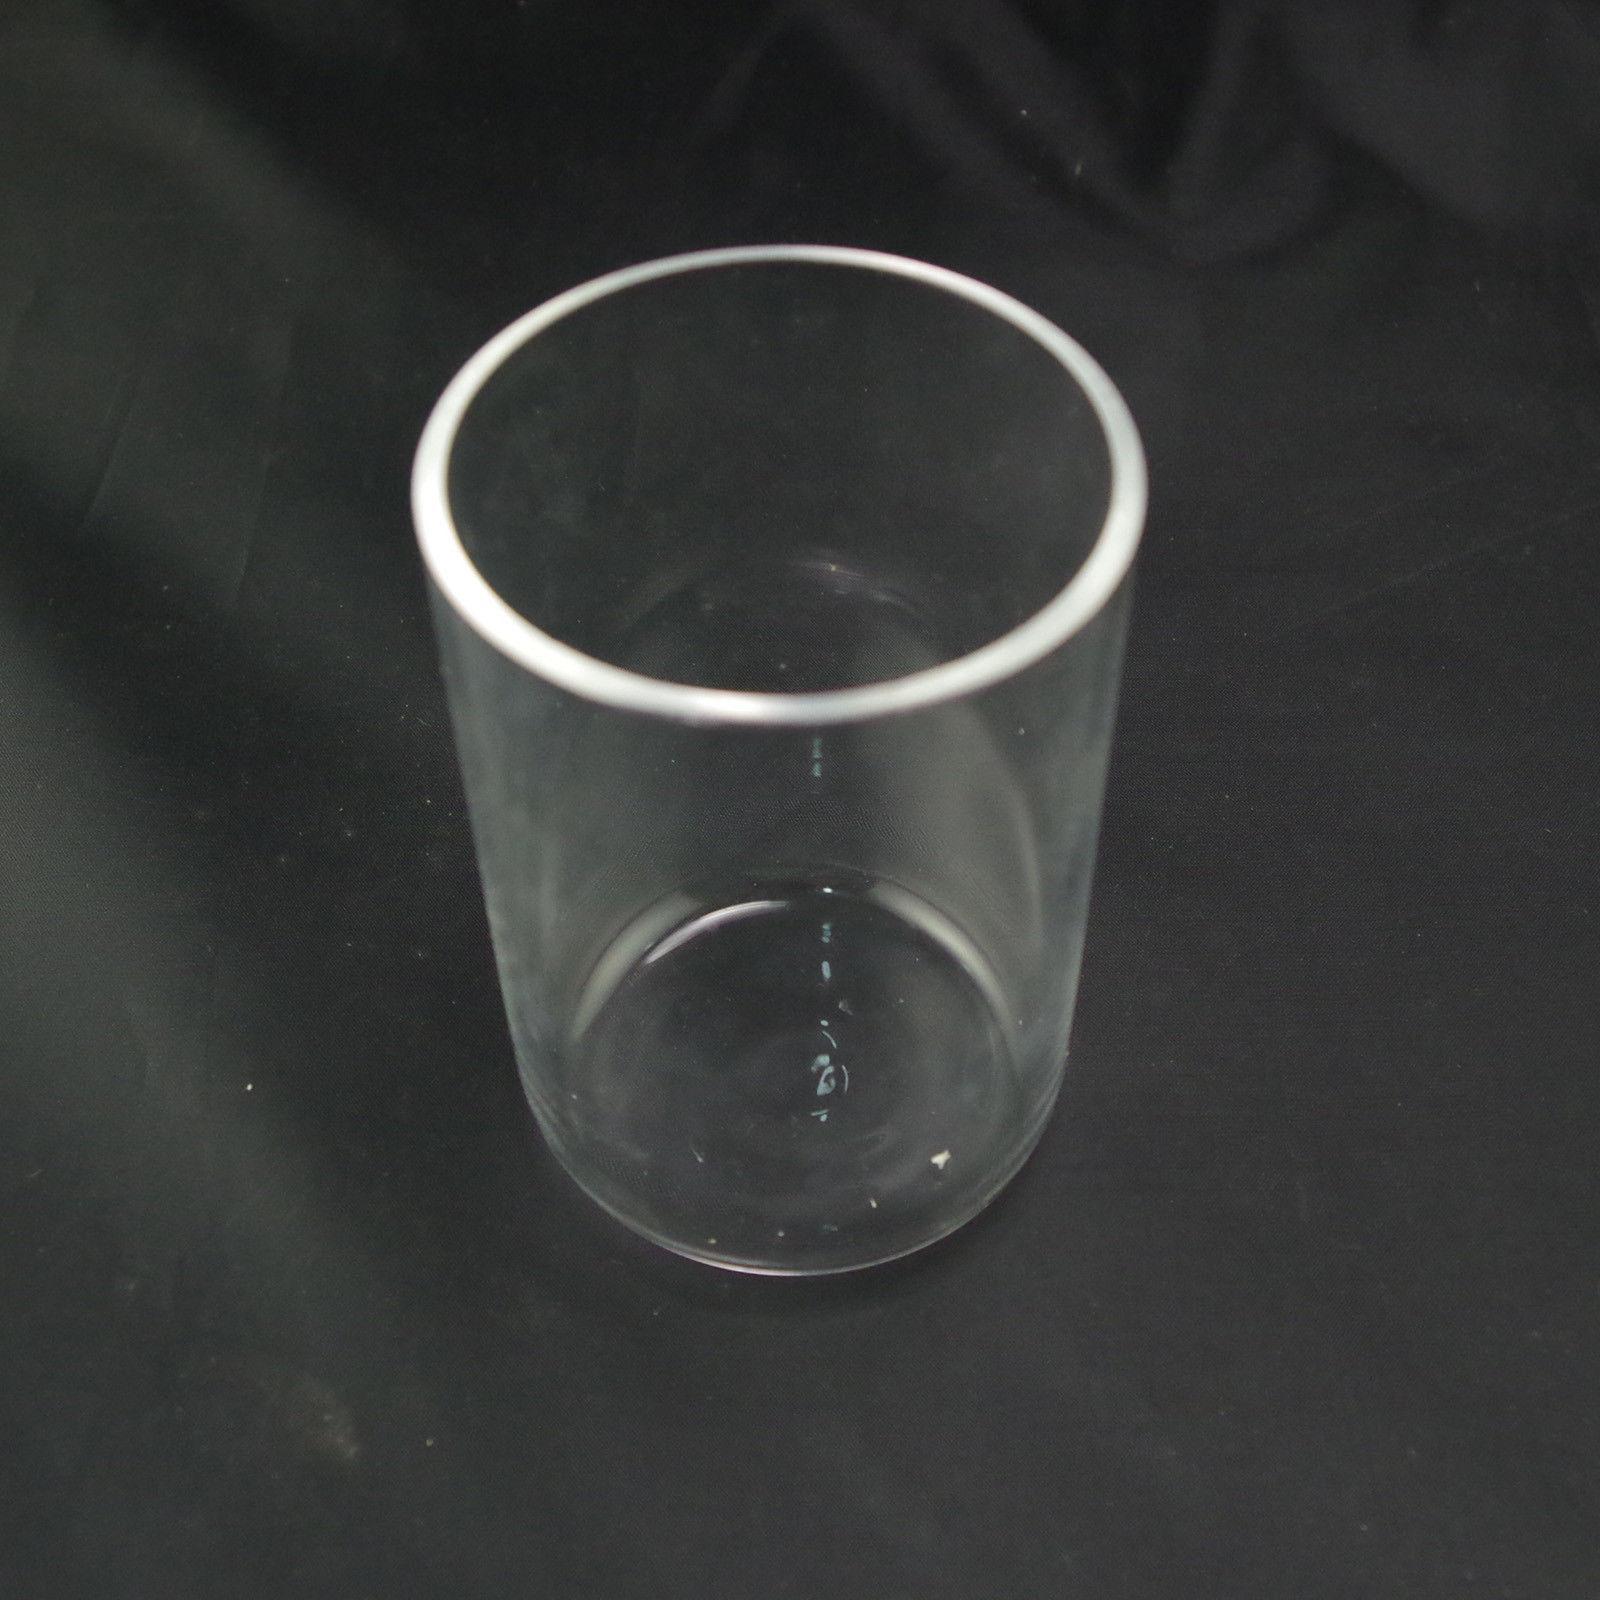 100ml Quartz Crucible 99.9% SiO2 Silica Crucible 2mm Thickness Melting Point 1750 Degree C